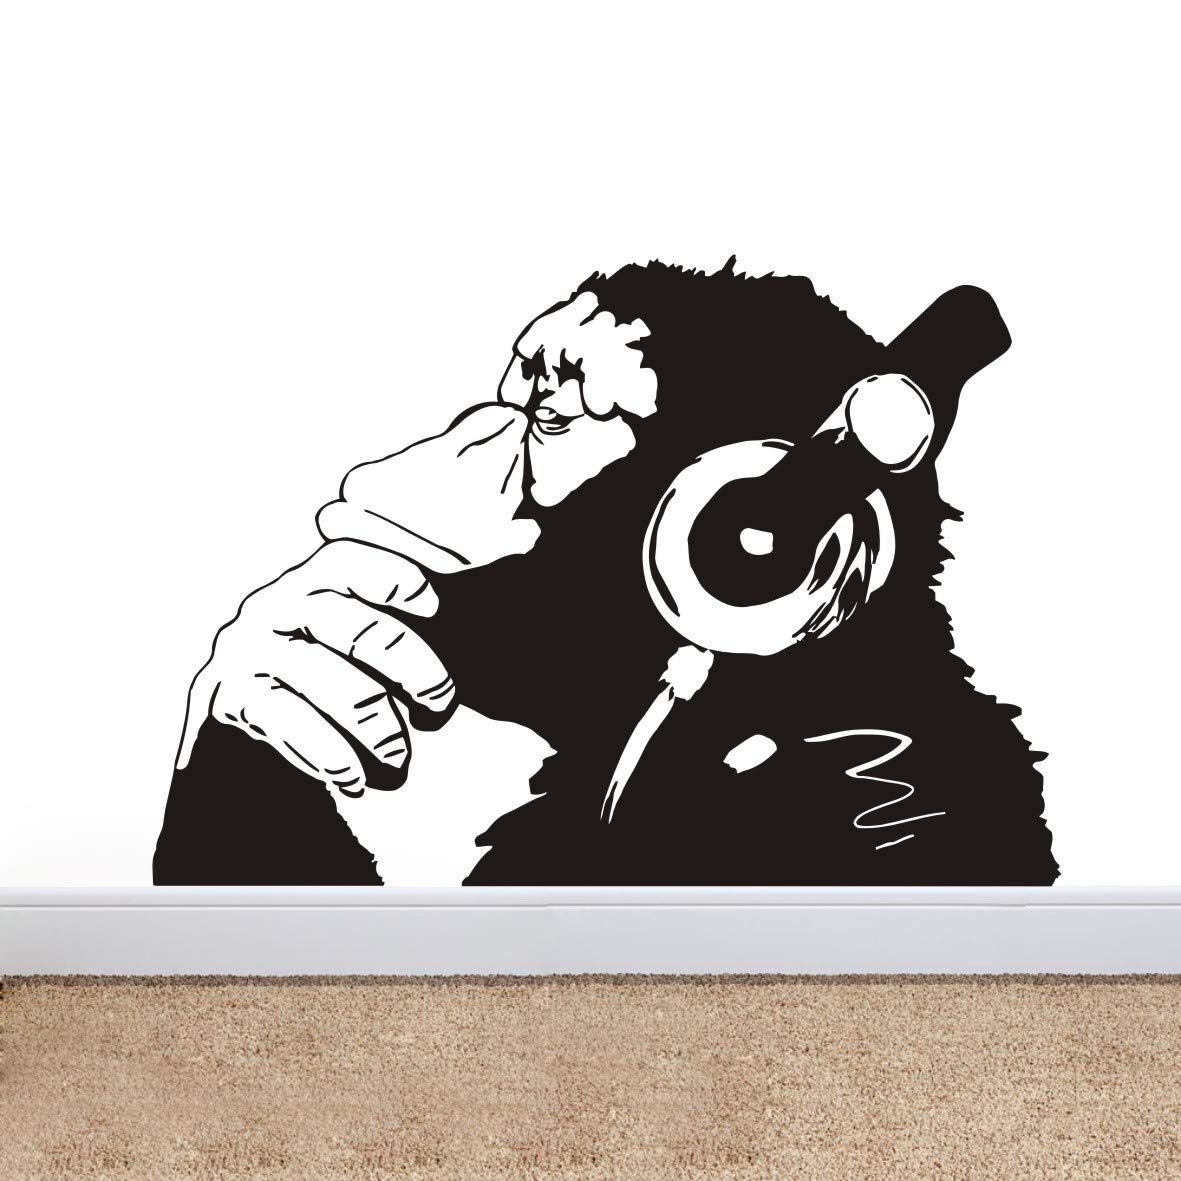 Large Banksy Graffit Monkey Wall Decal Headphone Music Chimp Wall Mural Art Vinyl Wall Sticker for Living Room Bedroom Street Graffit Wall Stickers W-23 (70X100CM, BLACK) YOYOYU